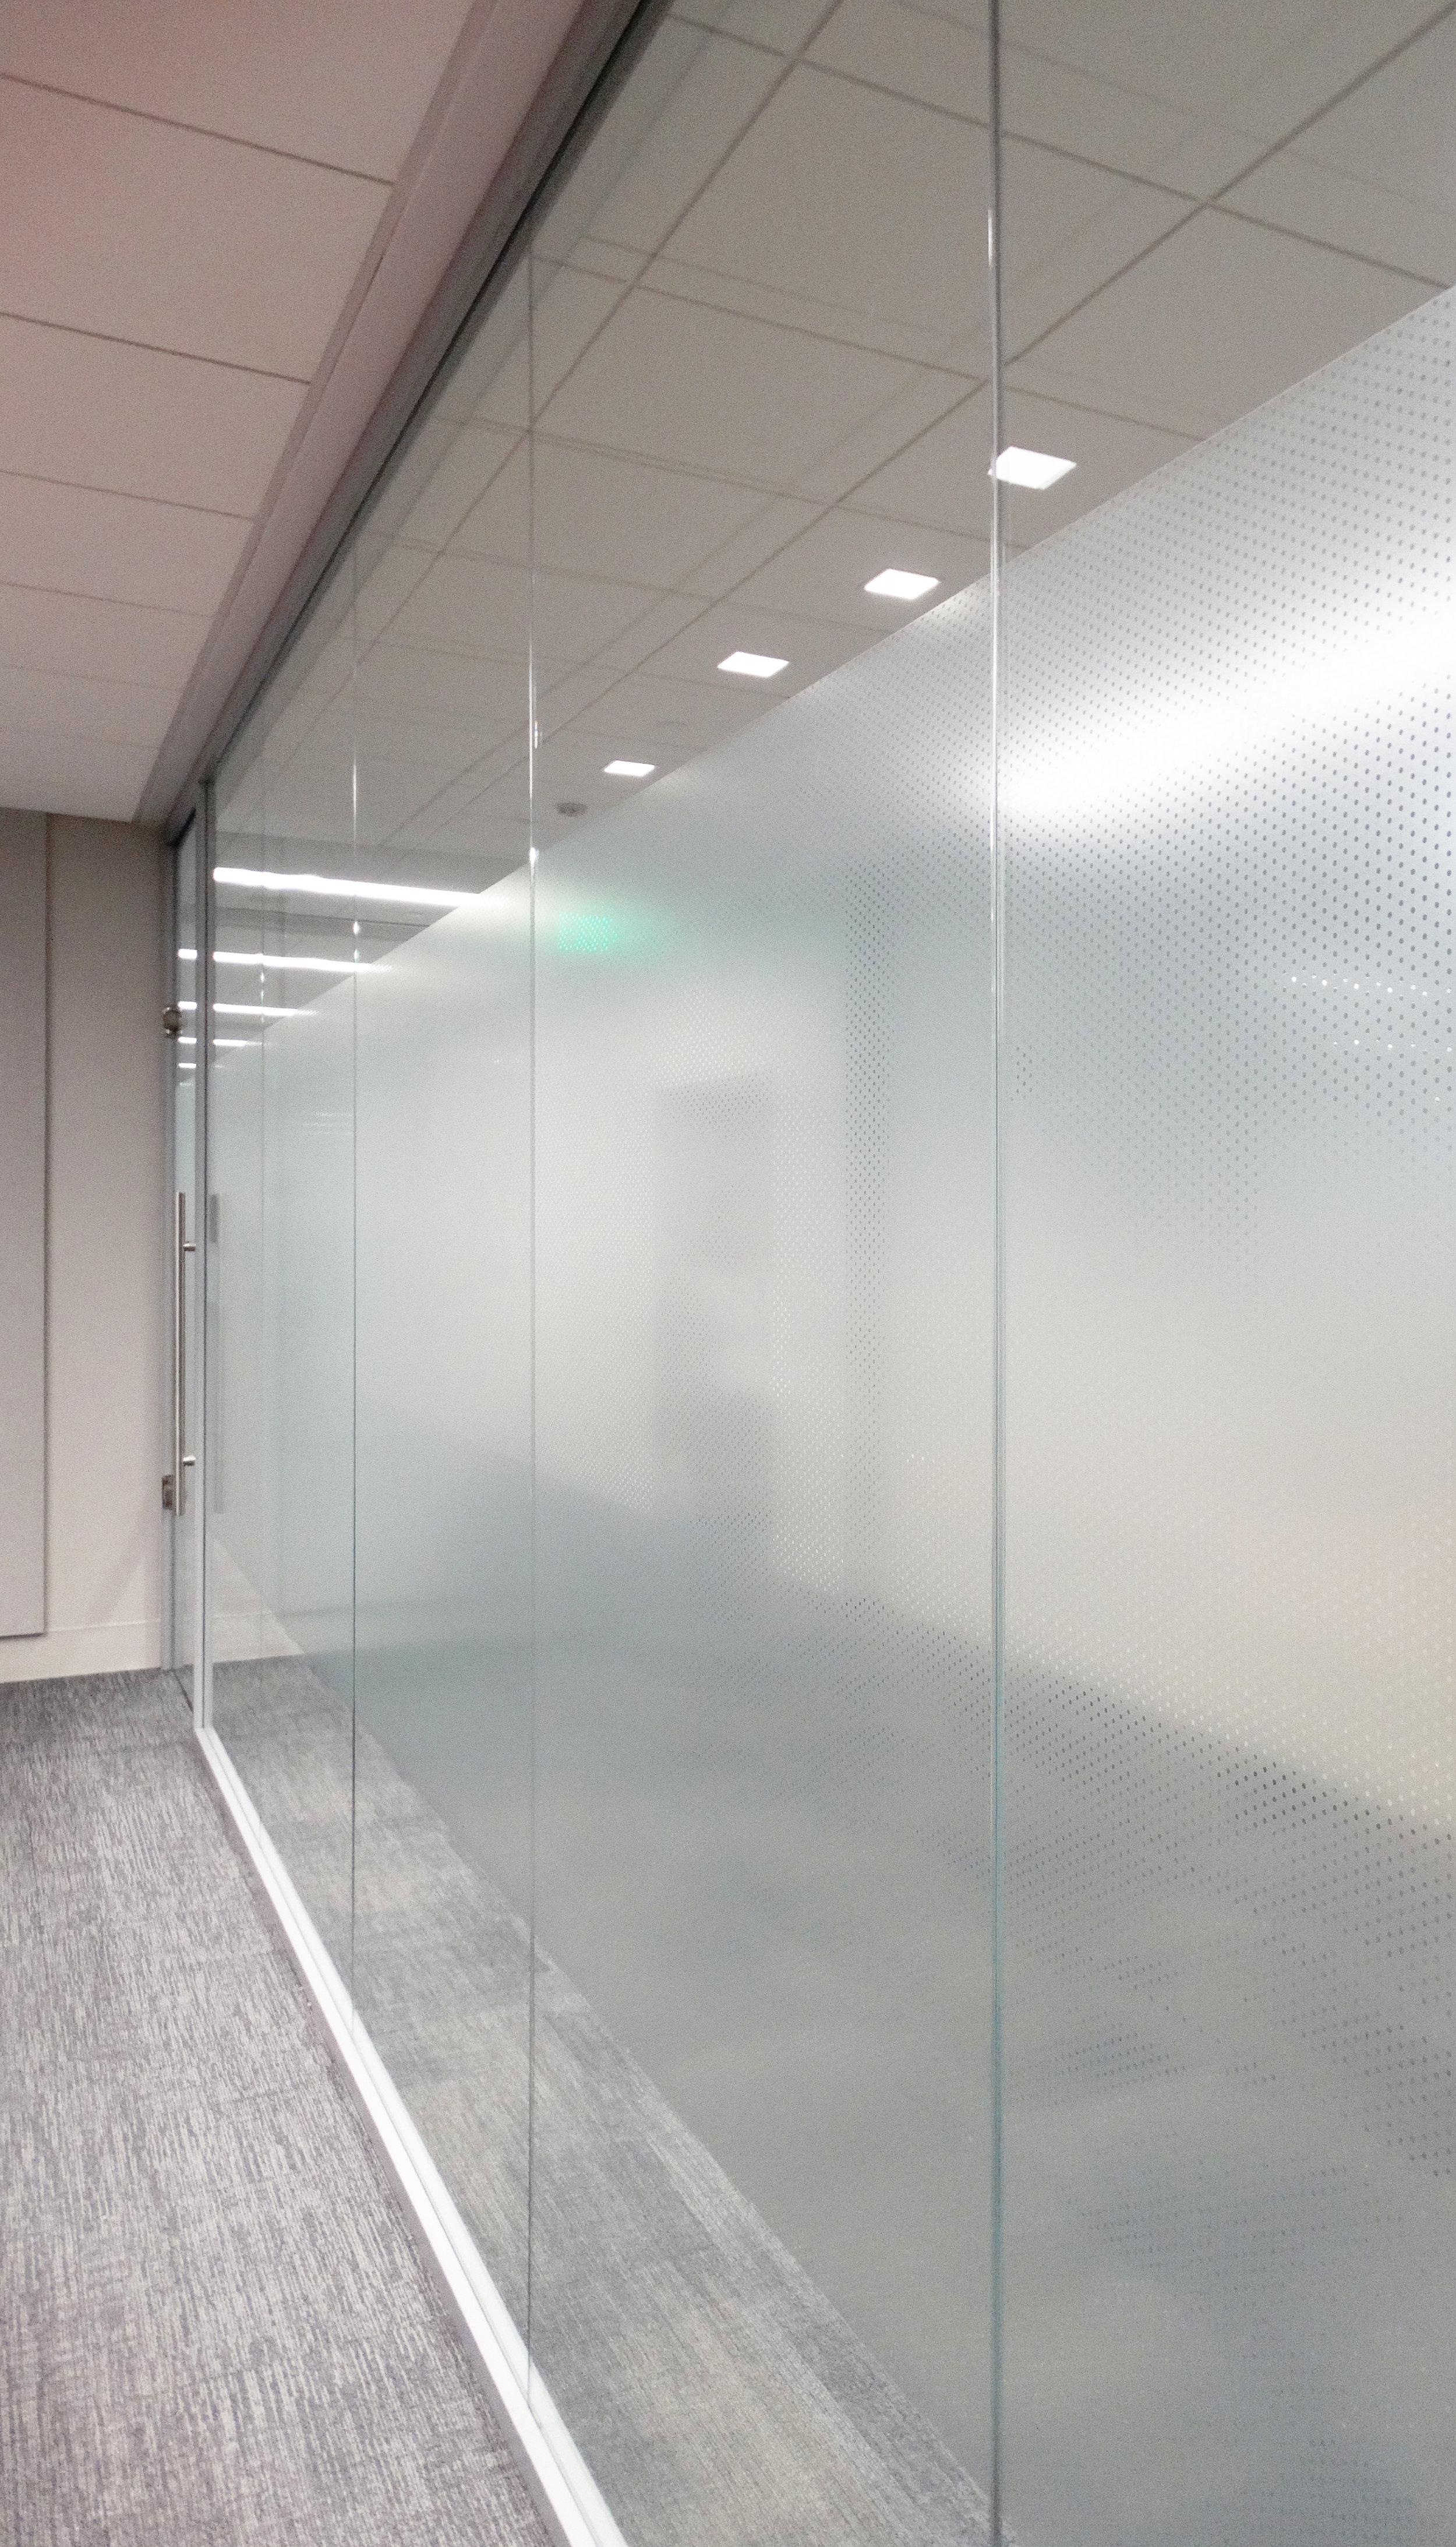 Litespace Aluminum Framed Butt Glazed Glass Wall - Spaceworks AI.jpg